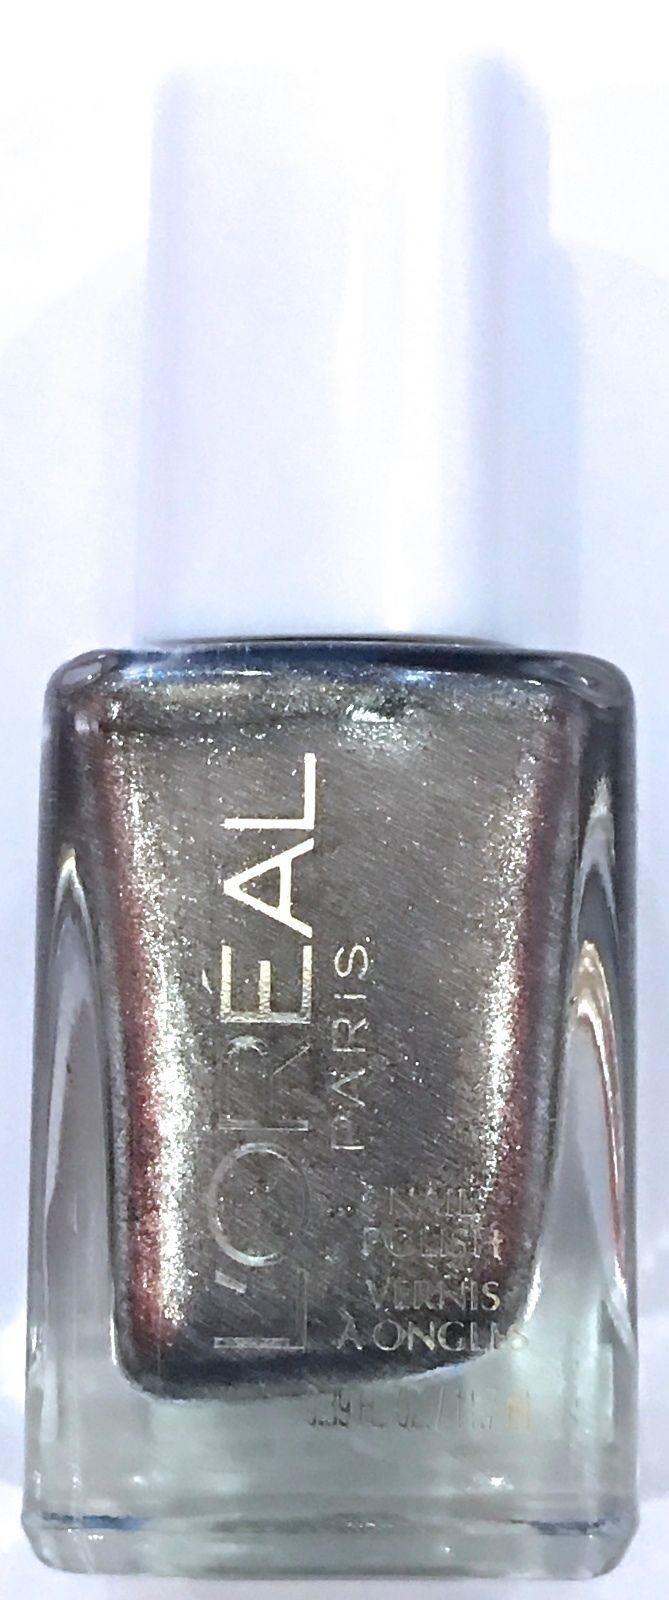 L\'oreal Loreal Paris Colour Riche Nail Polish # 355 Valiant Color of ...